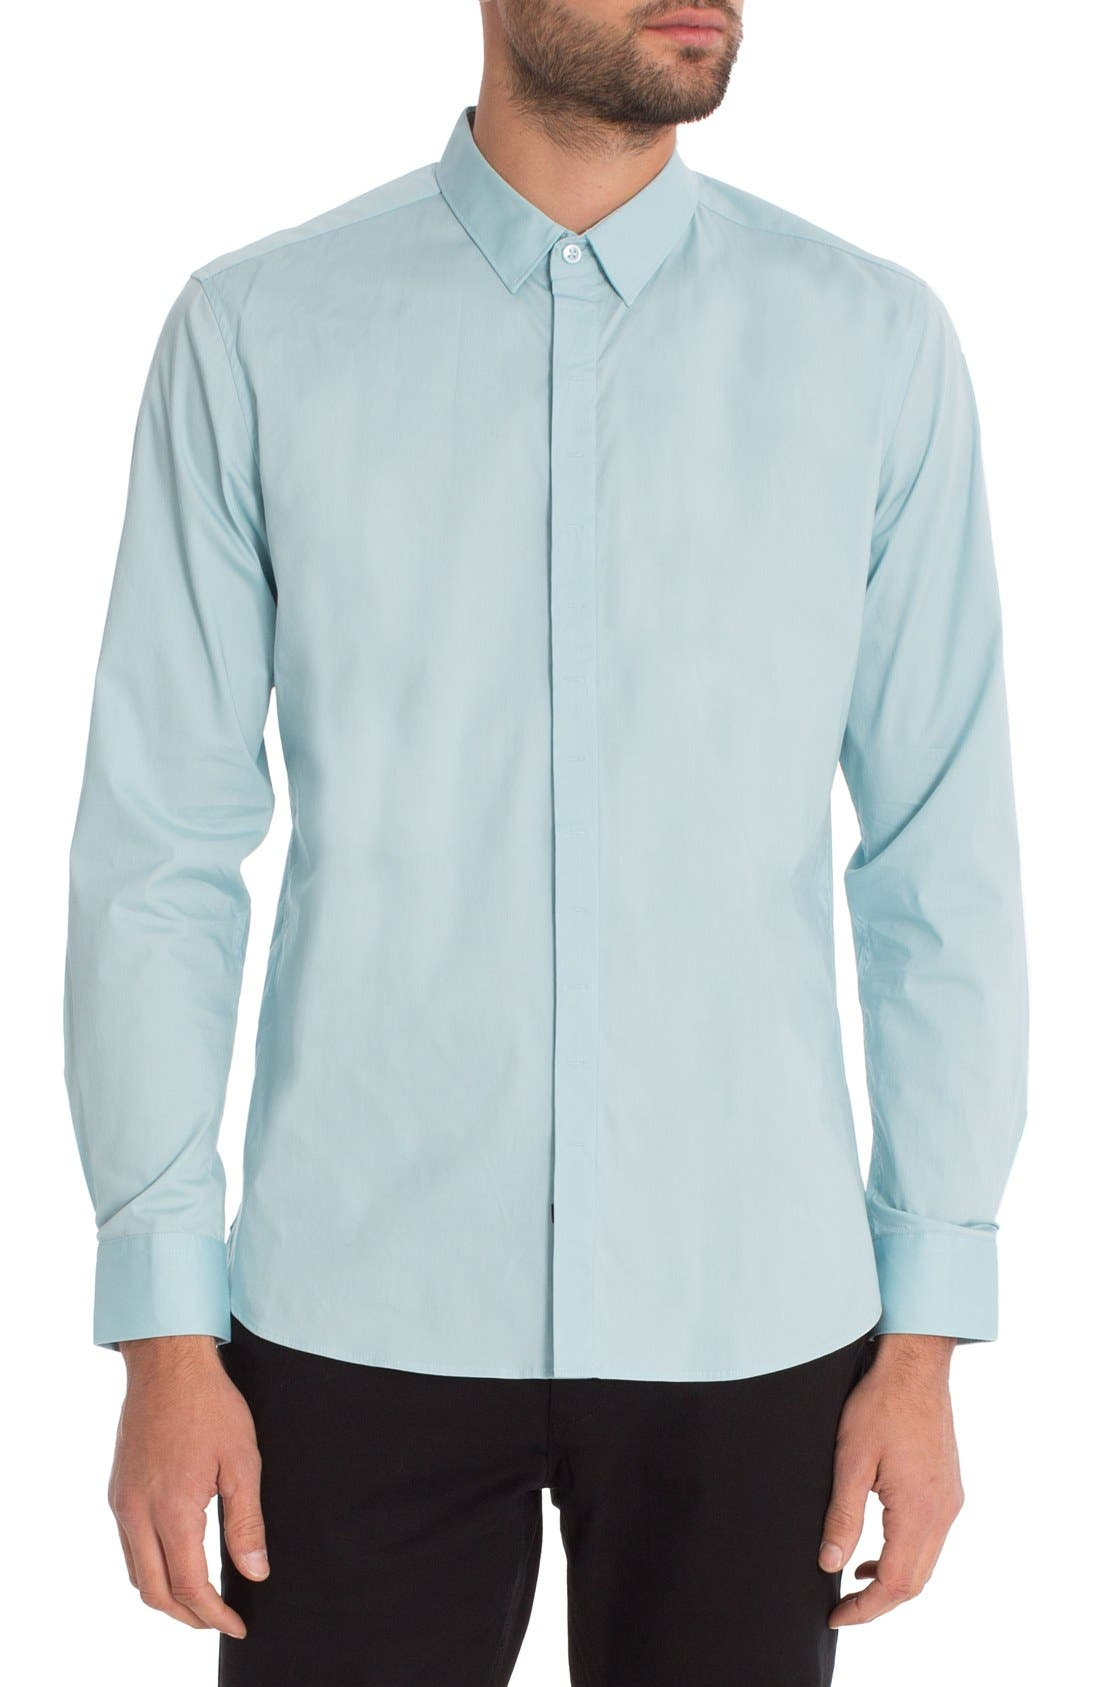 'Peace Train' Trim Fit Woven Shirt,                             Main thumbnail 1, color,                             Sterling Blue